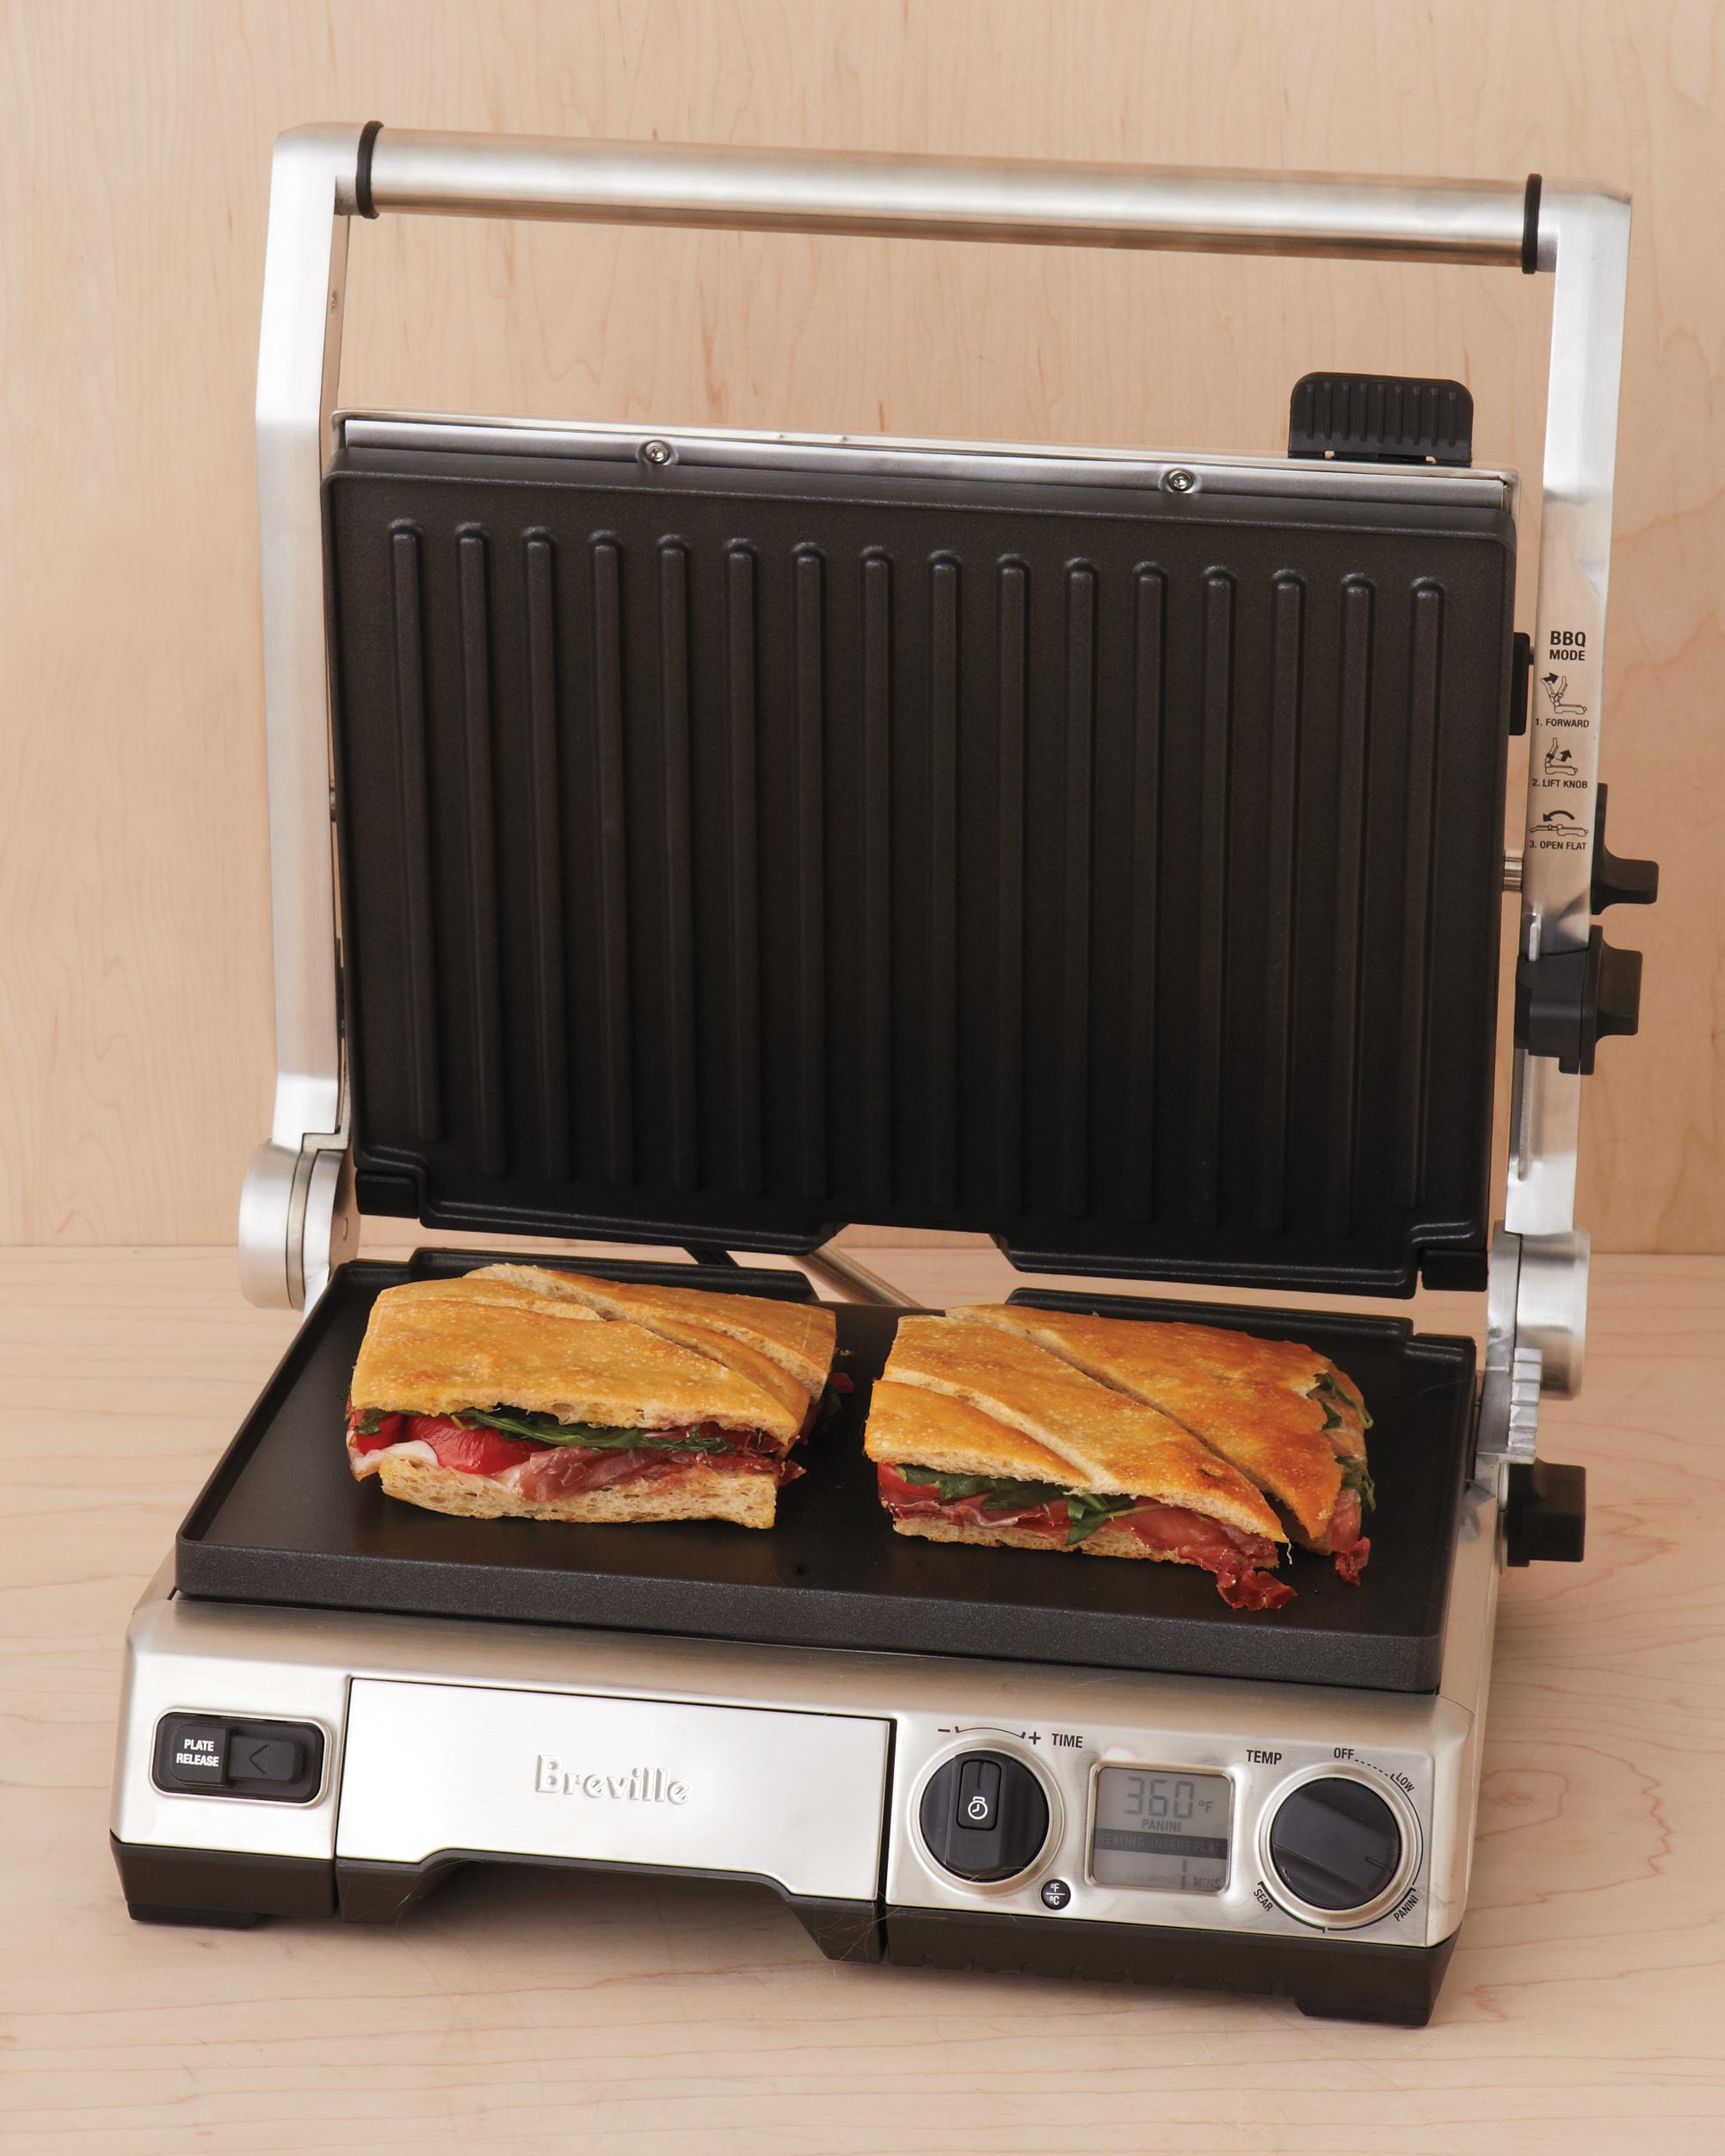 grill-012-mwd109796.jpg